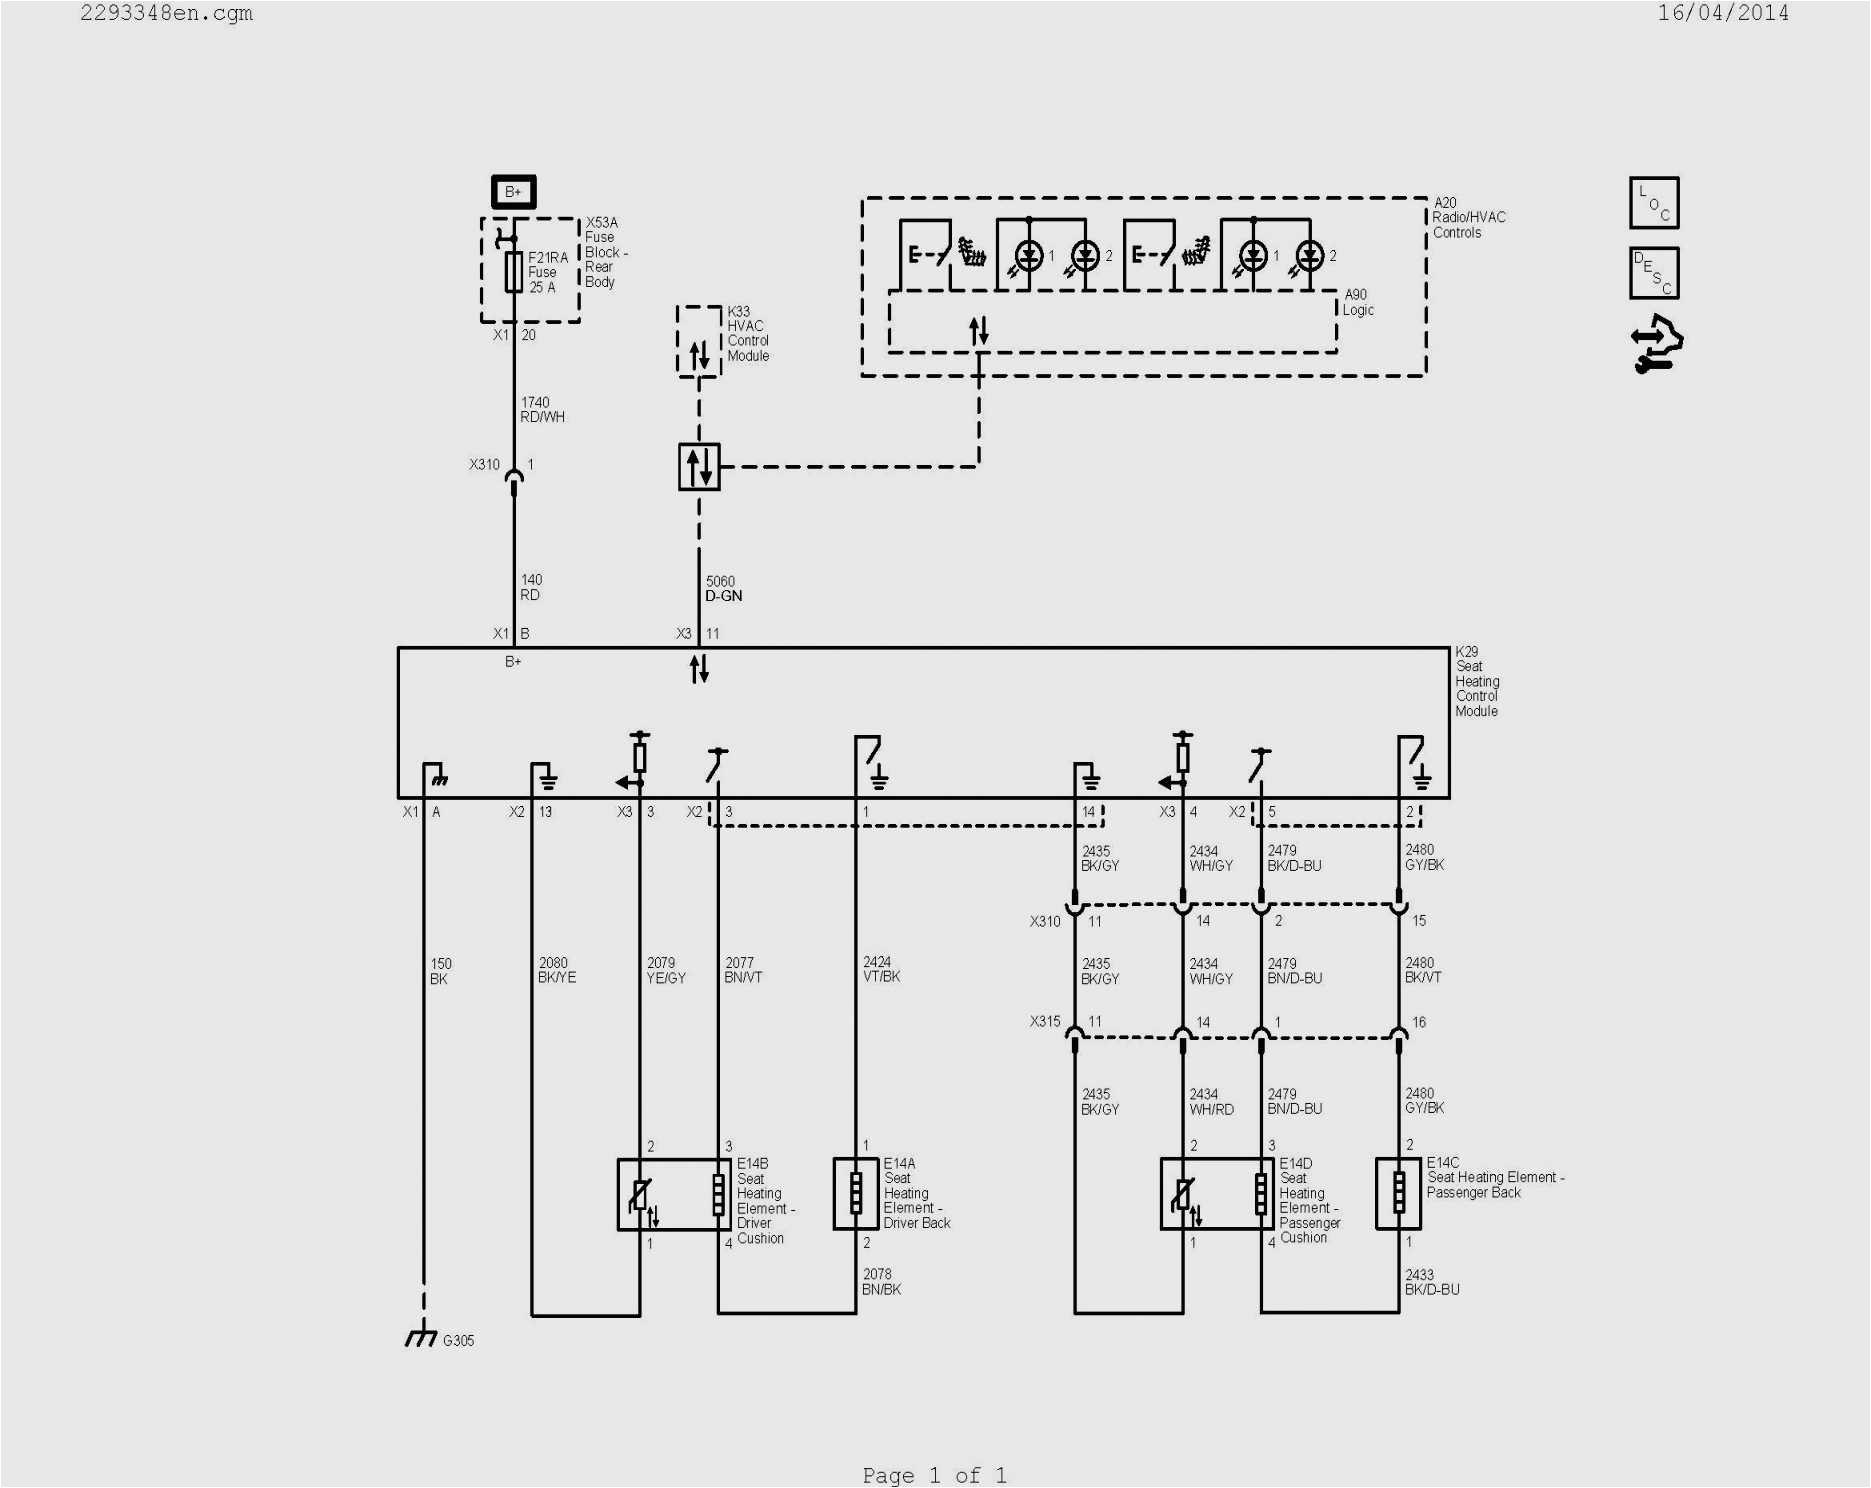 kenwood ddx470 wiring diagram kenwood wiring harness diagram trusted wiring diagrams u2022 rh sivamuni kenwood wiring